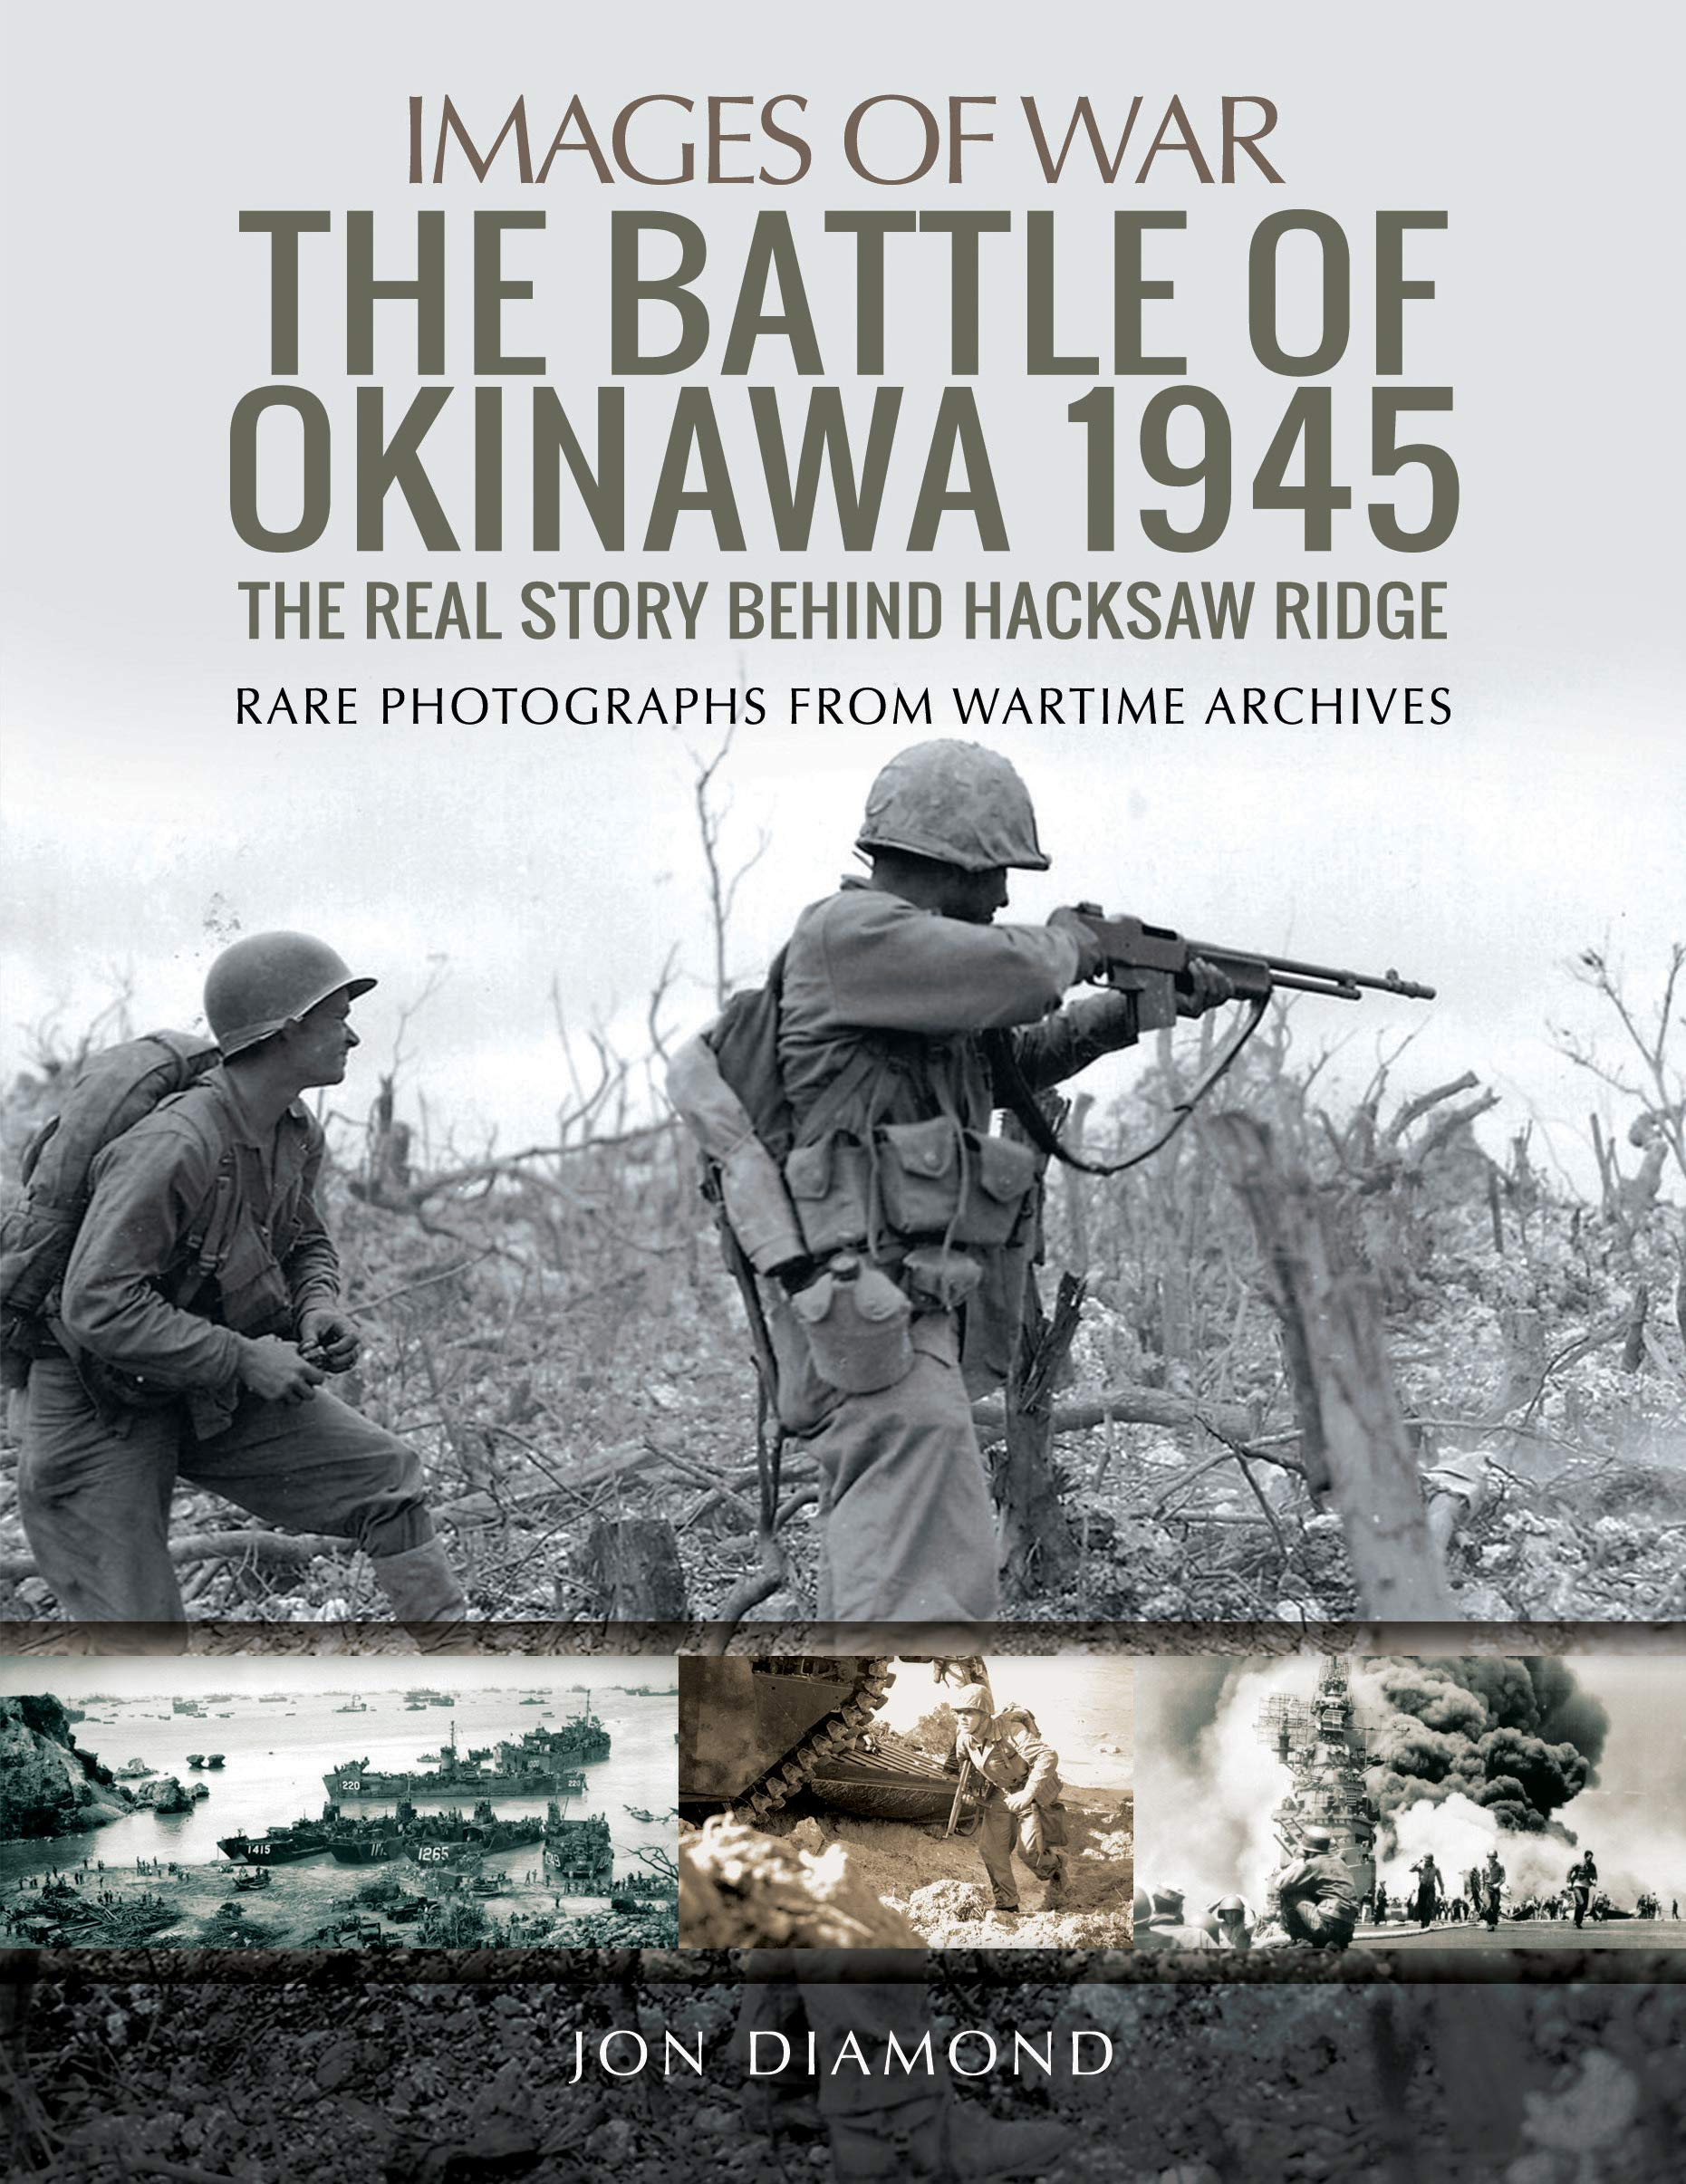 The Battle Of Okinawa 1945 The Real Story Behind Hacksaw Ridge Images Of War Diamond Jon 9781526726001 Amazon Com Books